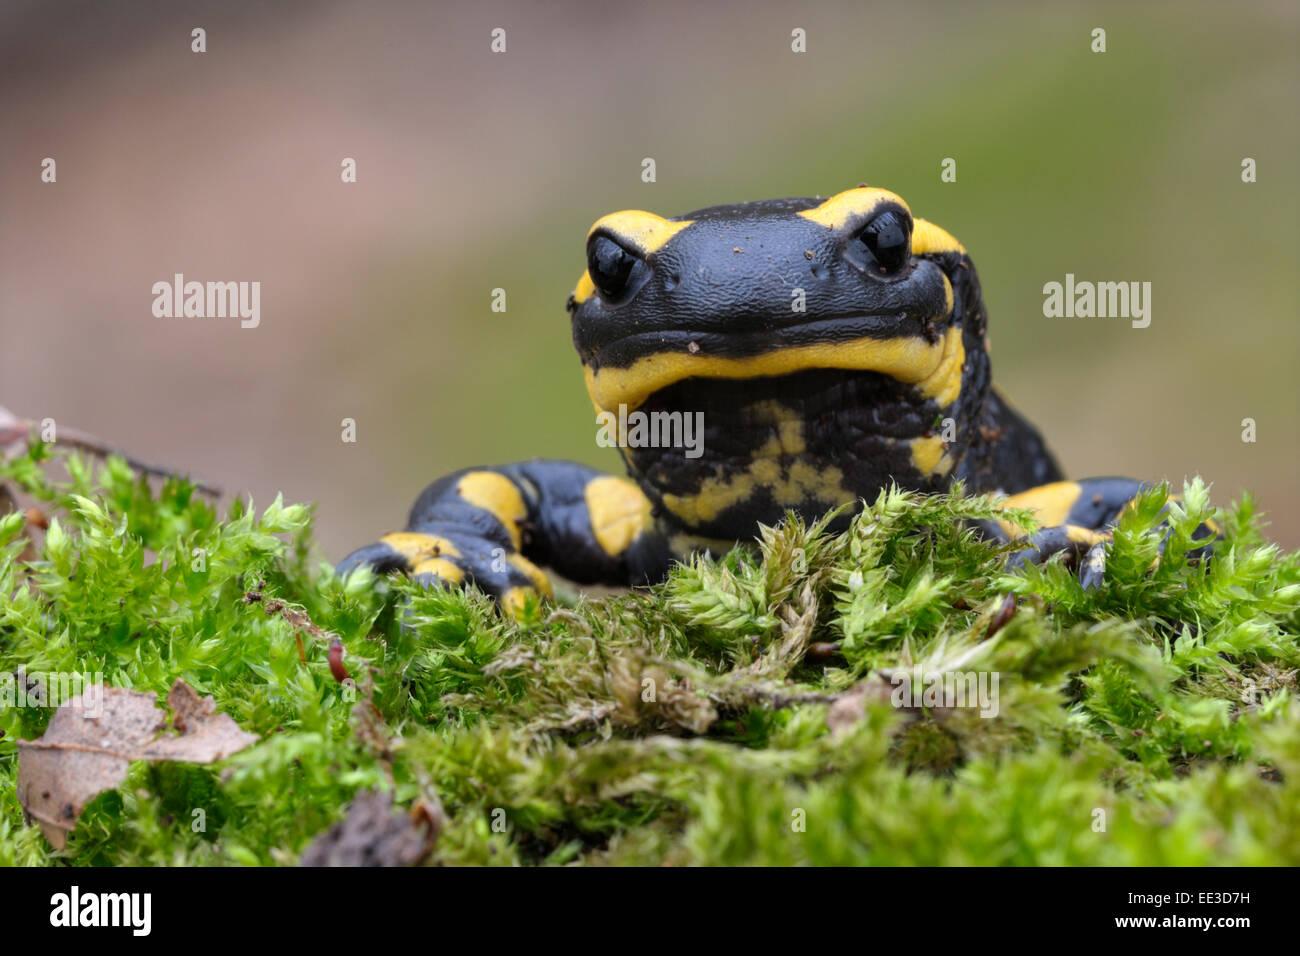 fire salamander [Salamandra salamandra] feuersalamander germany - Stock Image